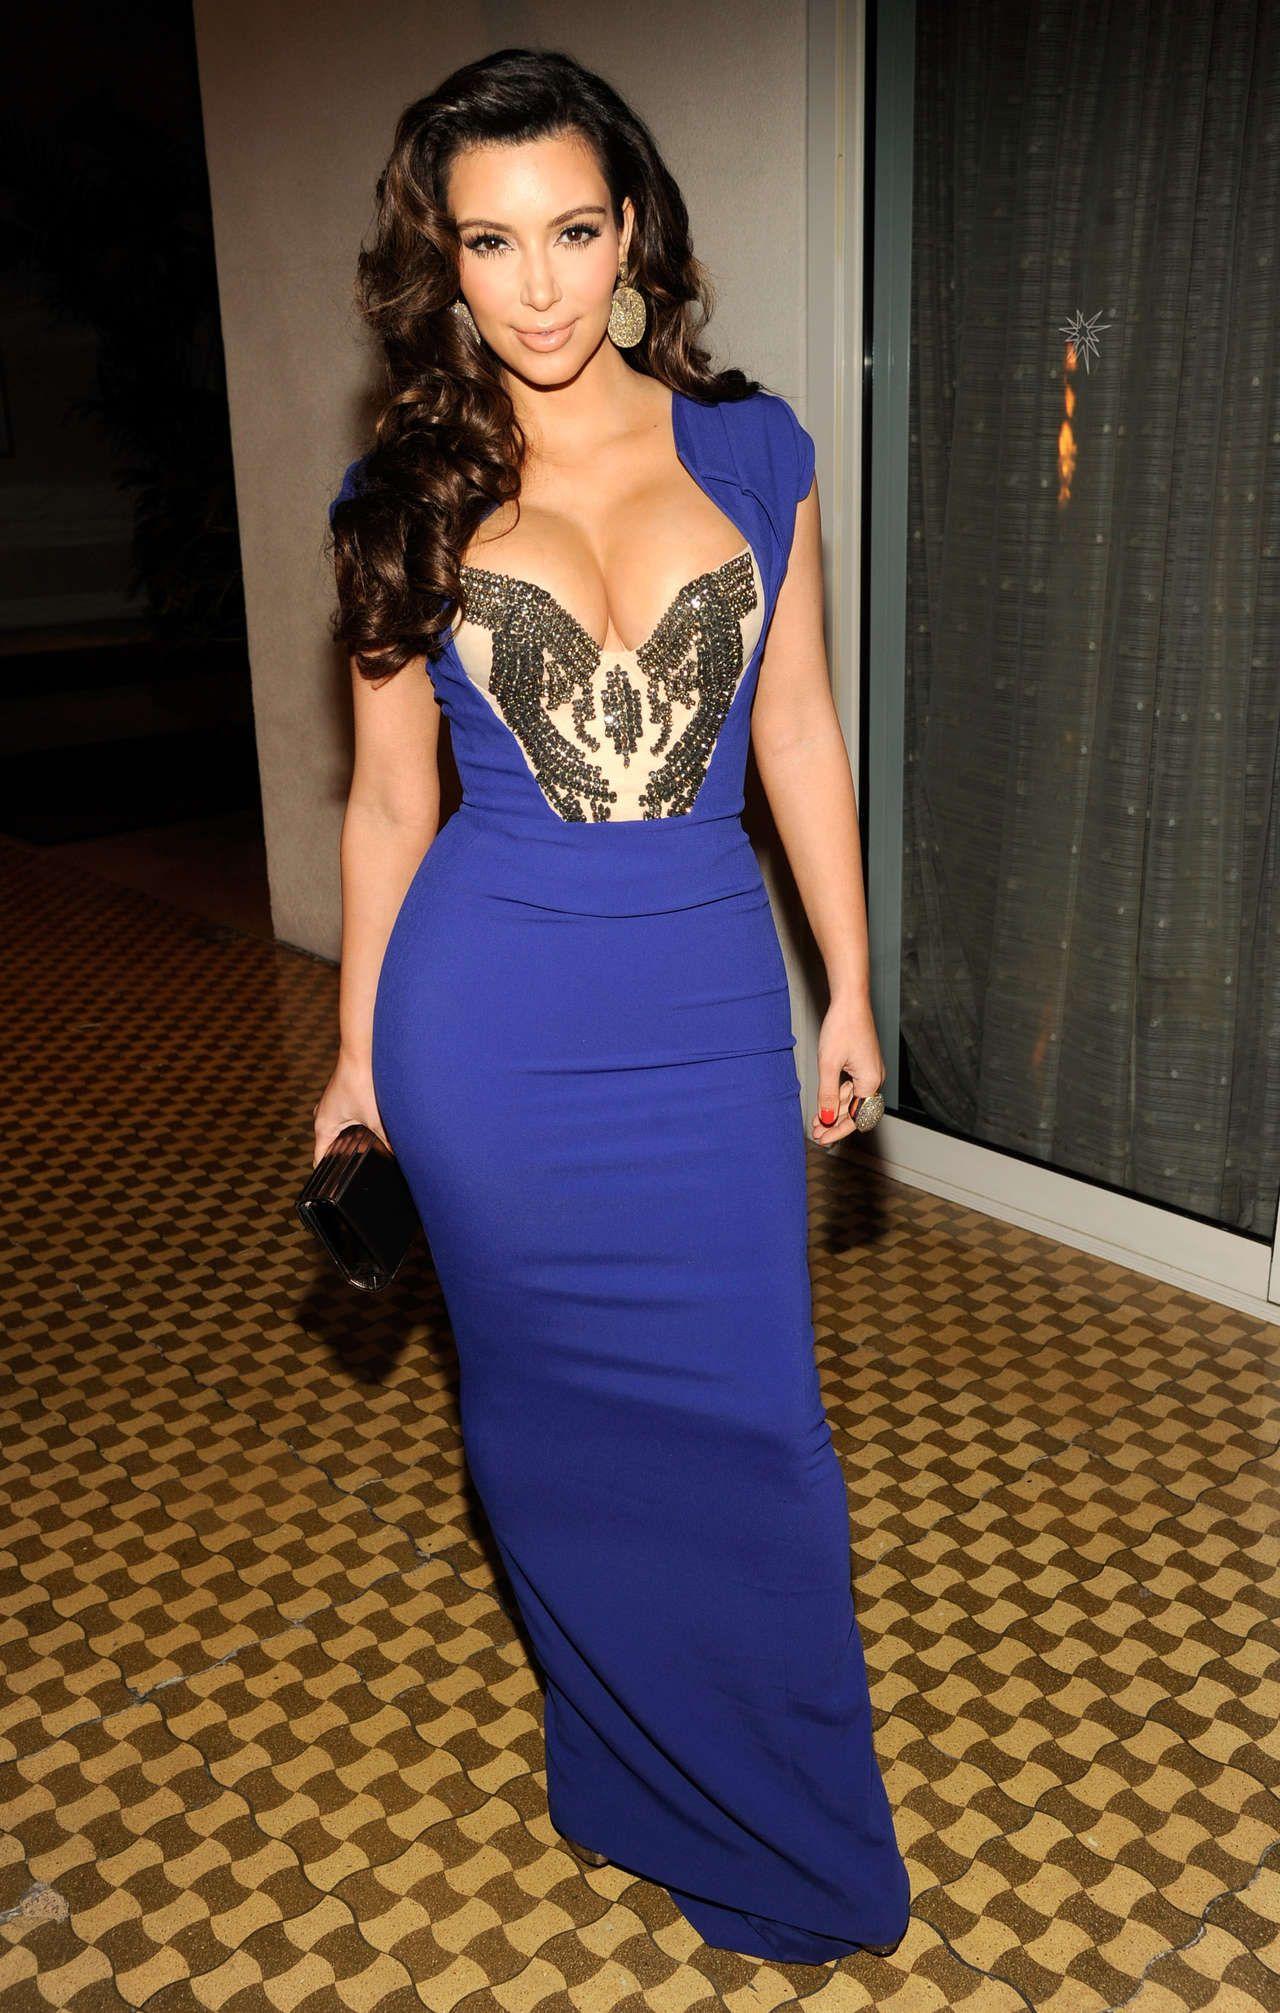 Blue dresses kim kardashian blue dress cleavage gotceleb